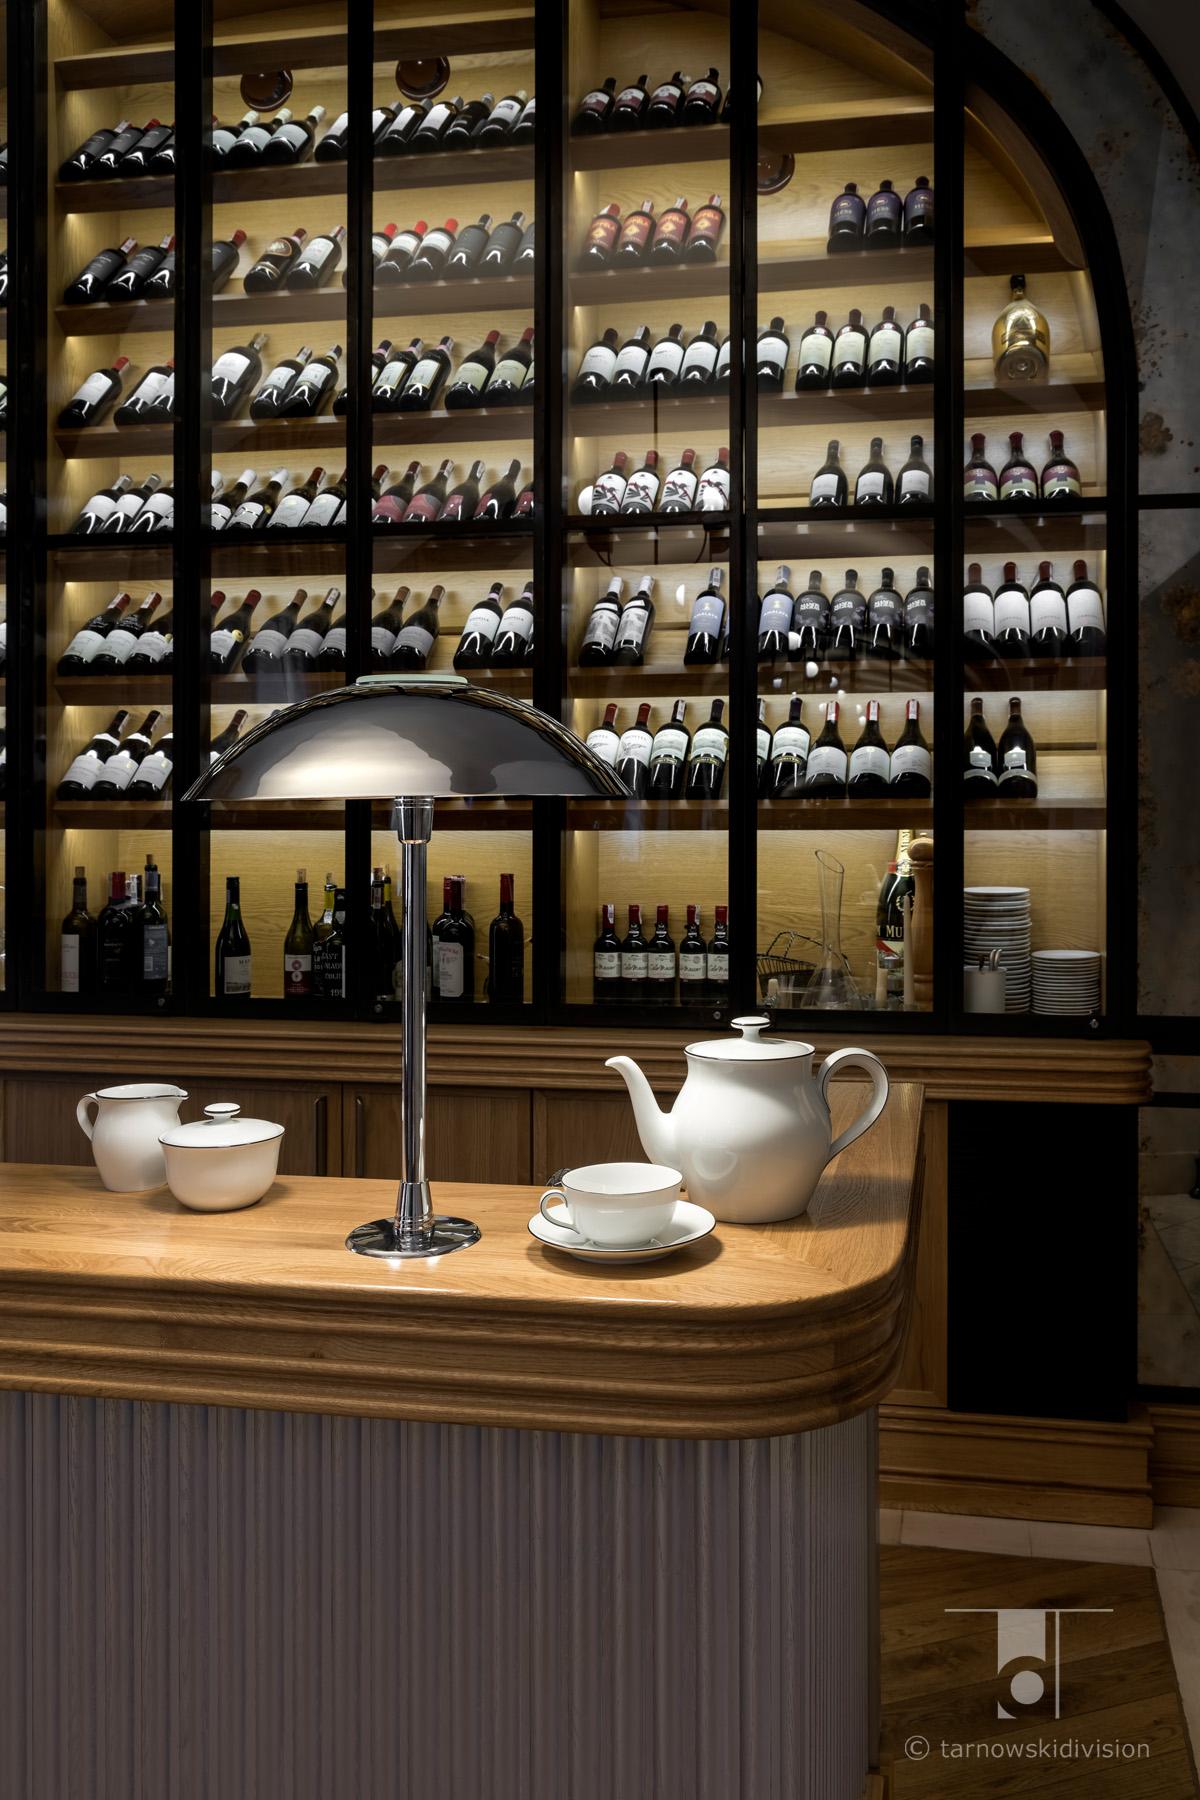 La Rotisserie Mamaison Hotel Le Regina restauracja projekt wnętrz restauracji restaurant interior design_tarnowskidivision